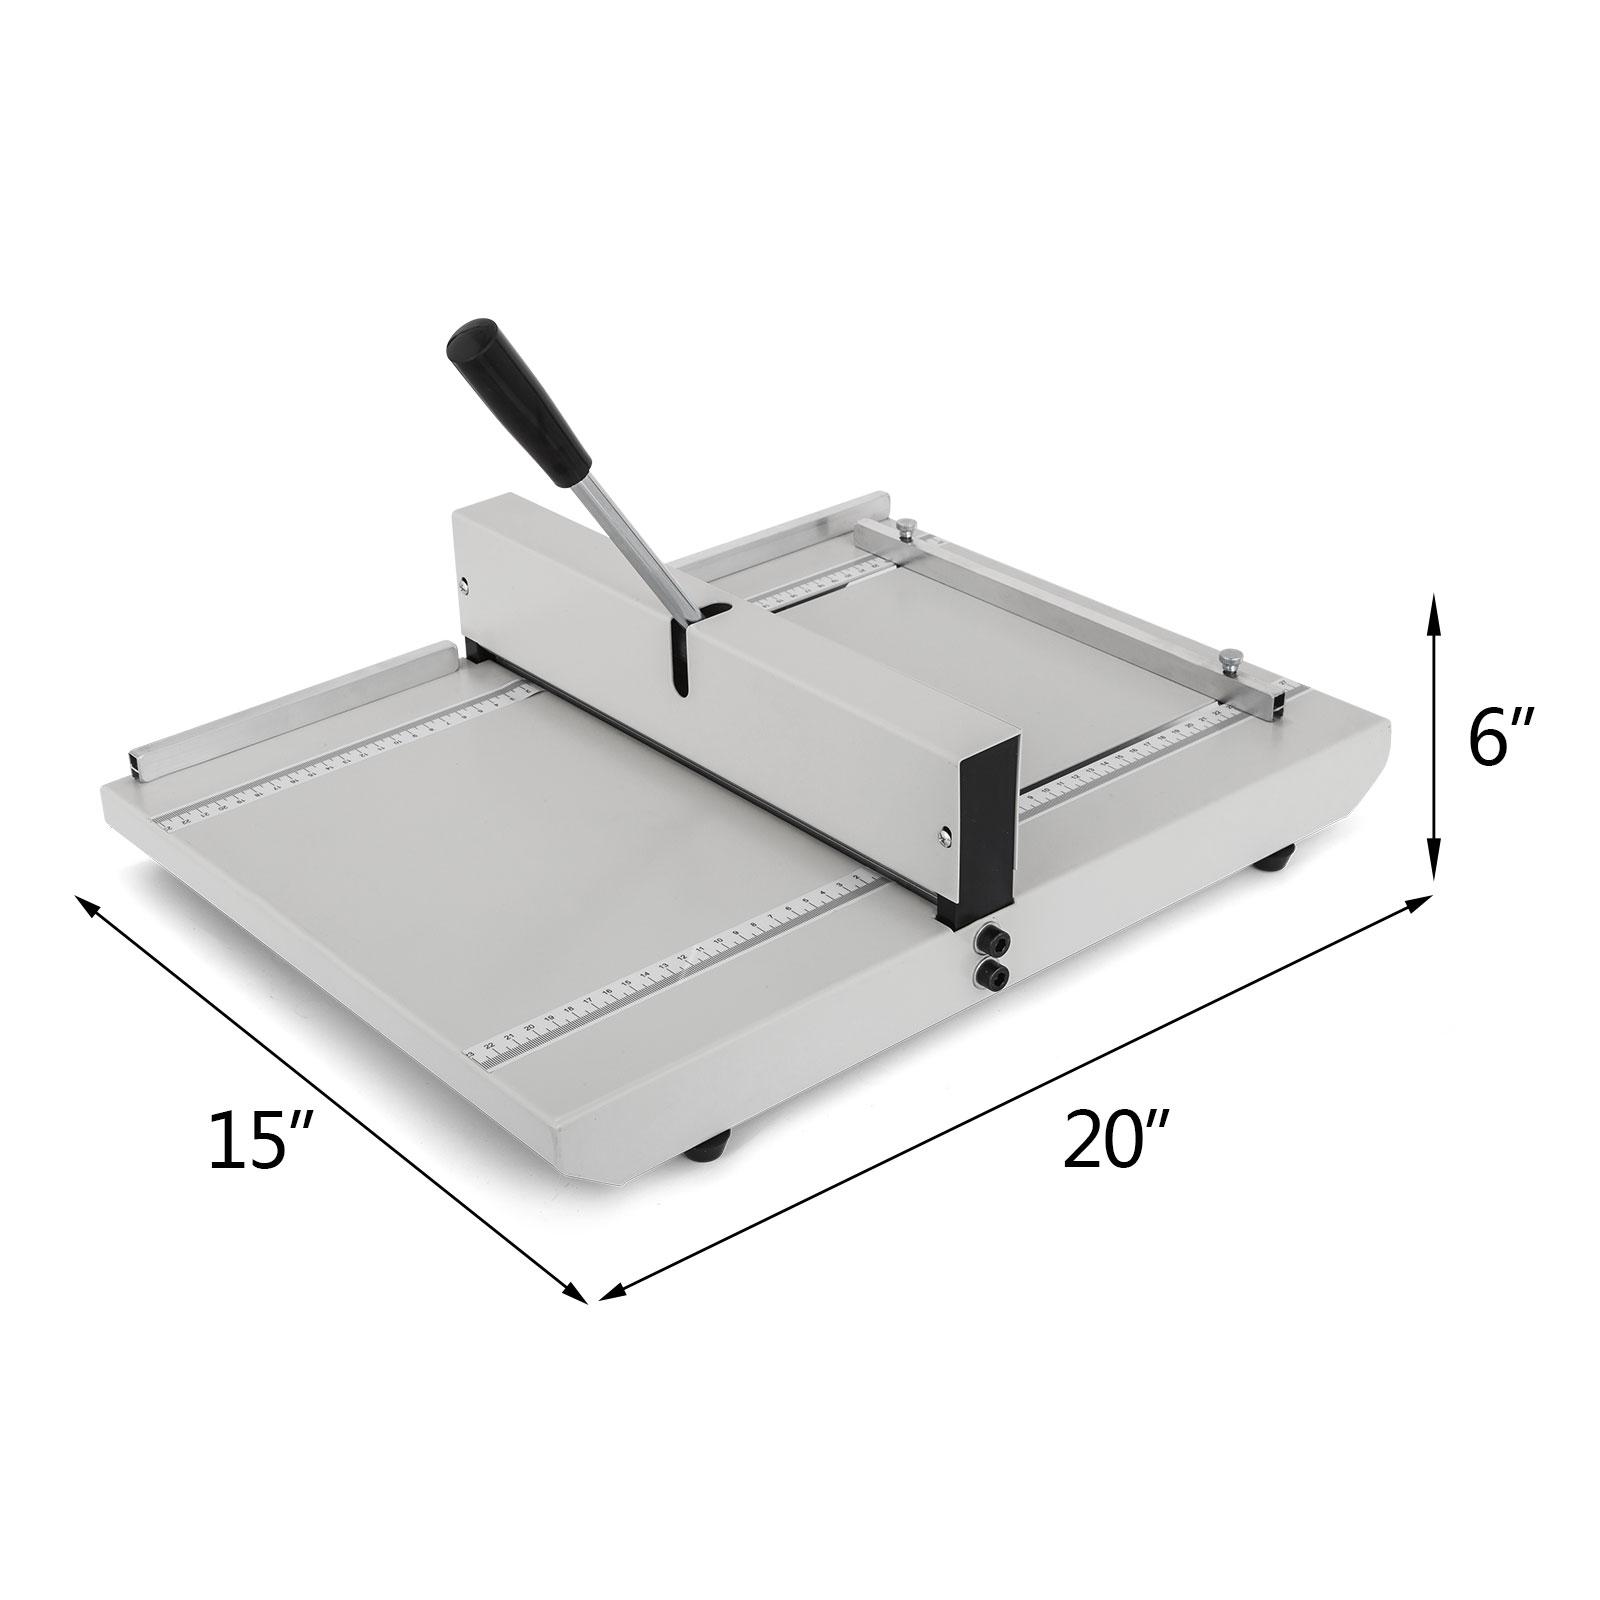 Cordonatrice-Perforatrice-Max-350-520mm-Profondita-Regolabile-Elettrica-Manuale miniatura 61